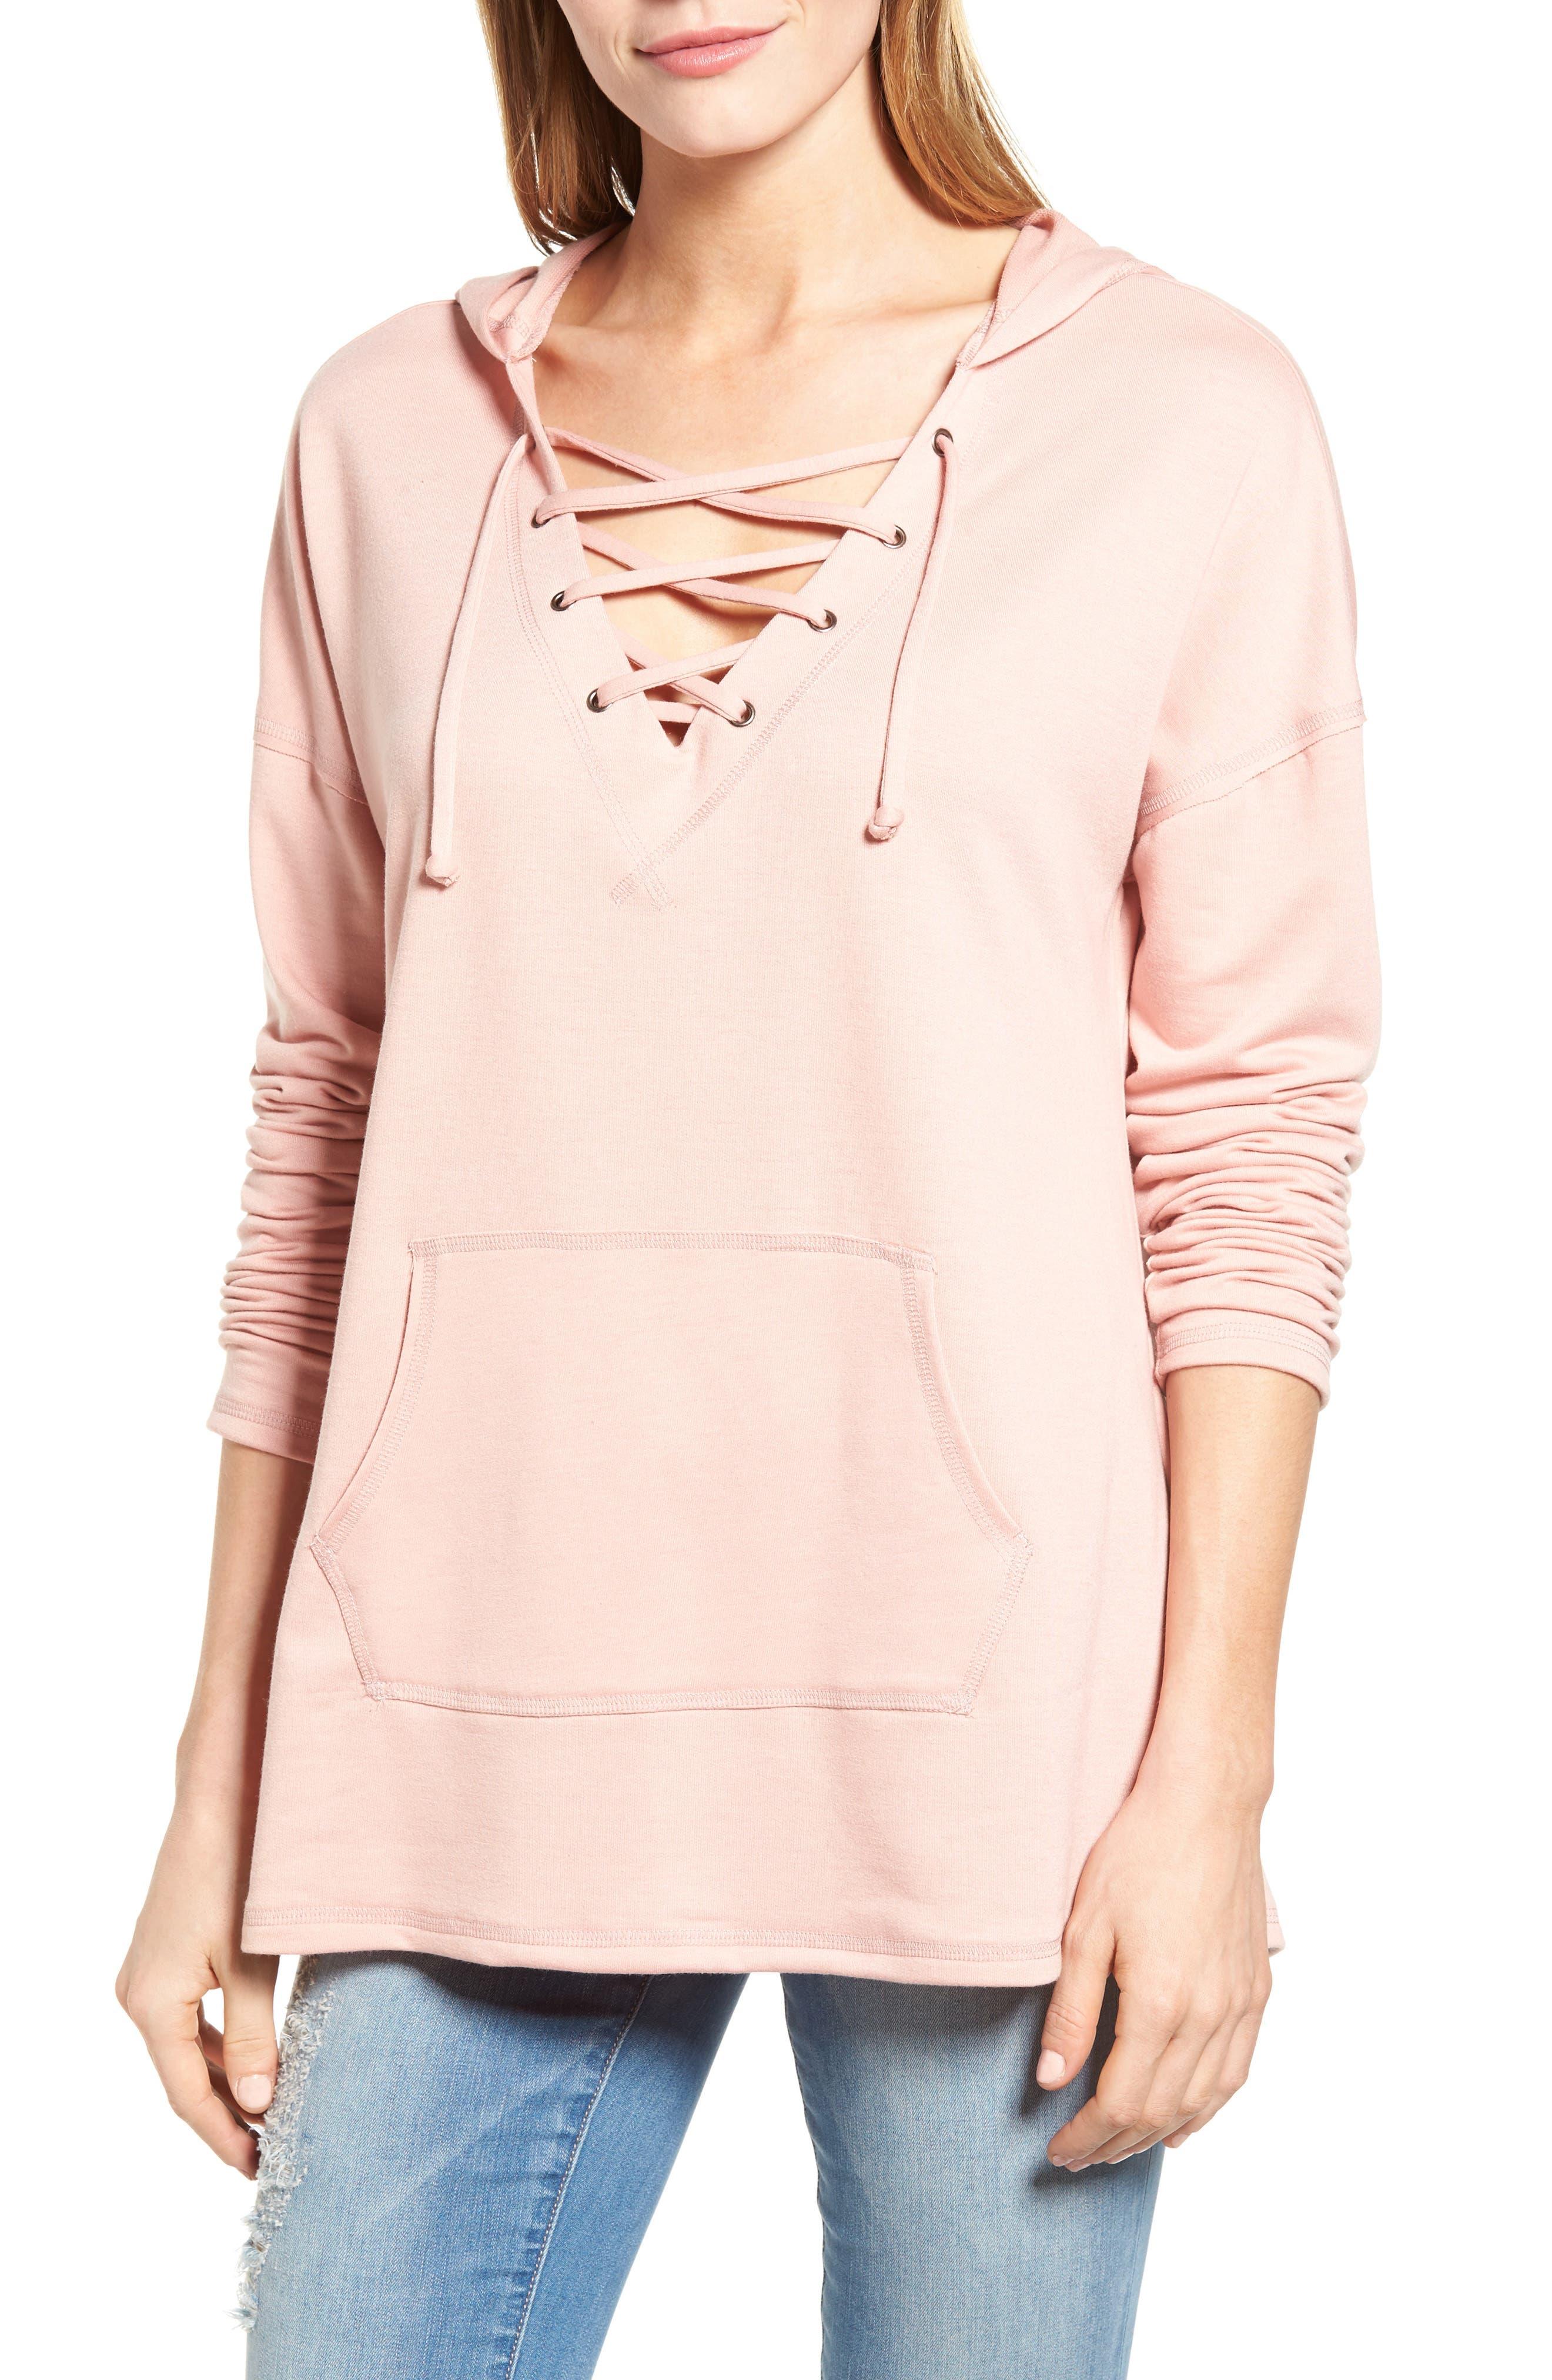 Main Image - Caslon® Lace-Up Hooded Sweatshirt (Regular & Petite)